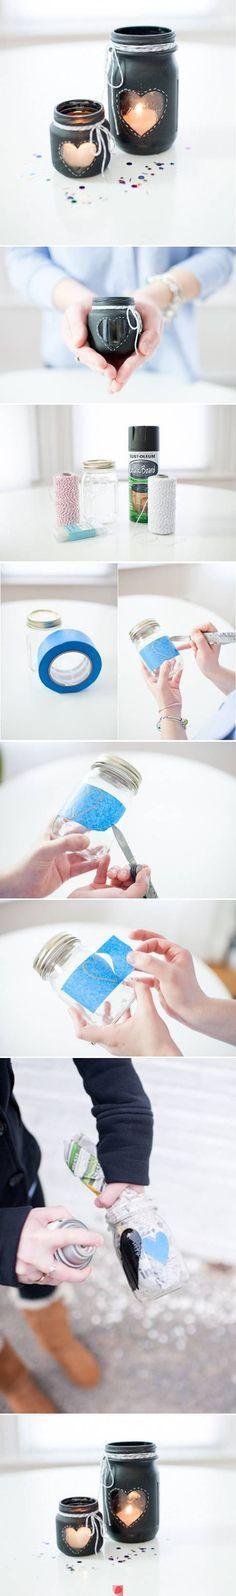 DIY Glass Jar Candlestick More